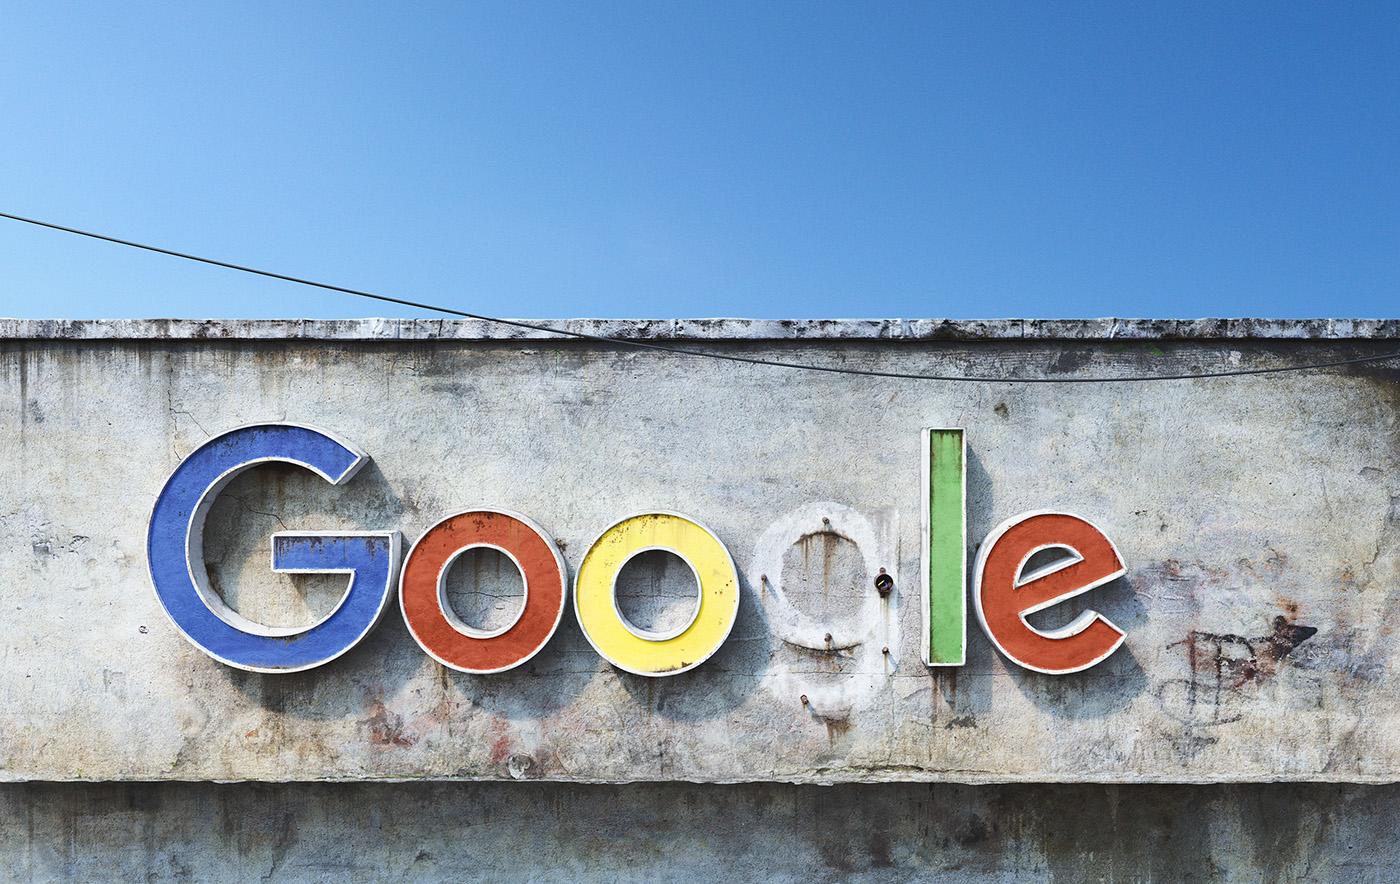 AndreiLacatusu social decay lettres logo enseigne typographie urbain urbex panneau google - Social decay : les logos de Twitter, Facebook et Tinder transformés en enseignes vintage